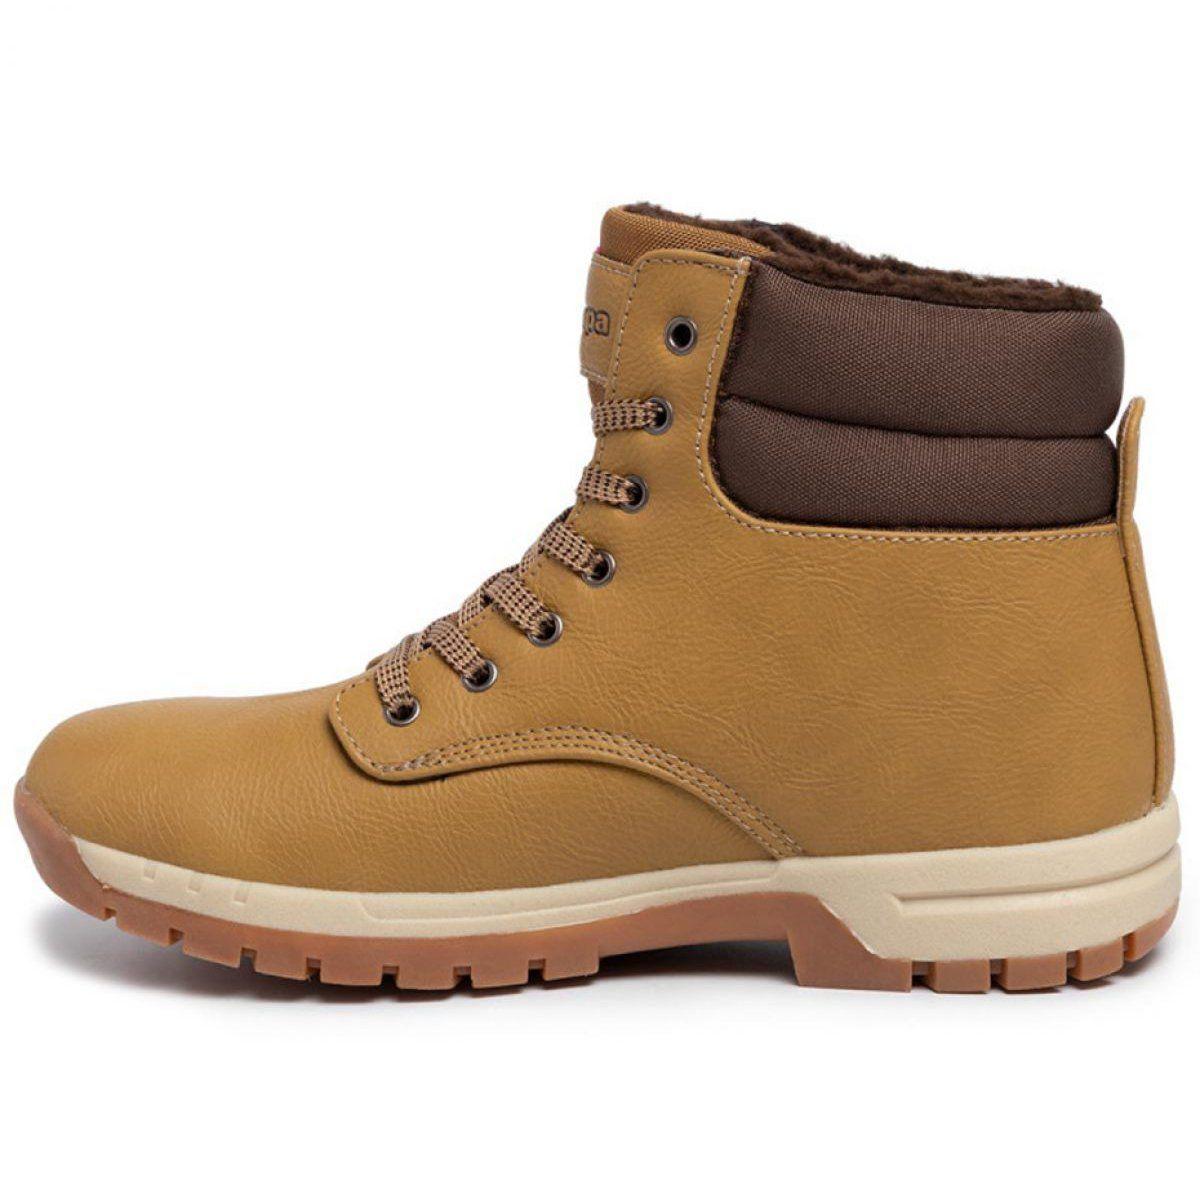 Buty Zimowe Kappa Woak M 242780 4150 Brazowe Winter Shoes Sport Shoes Men Boots